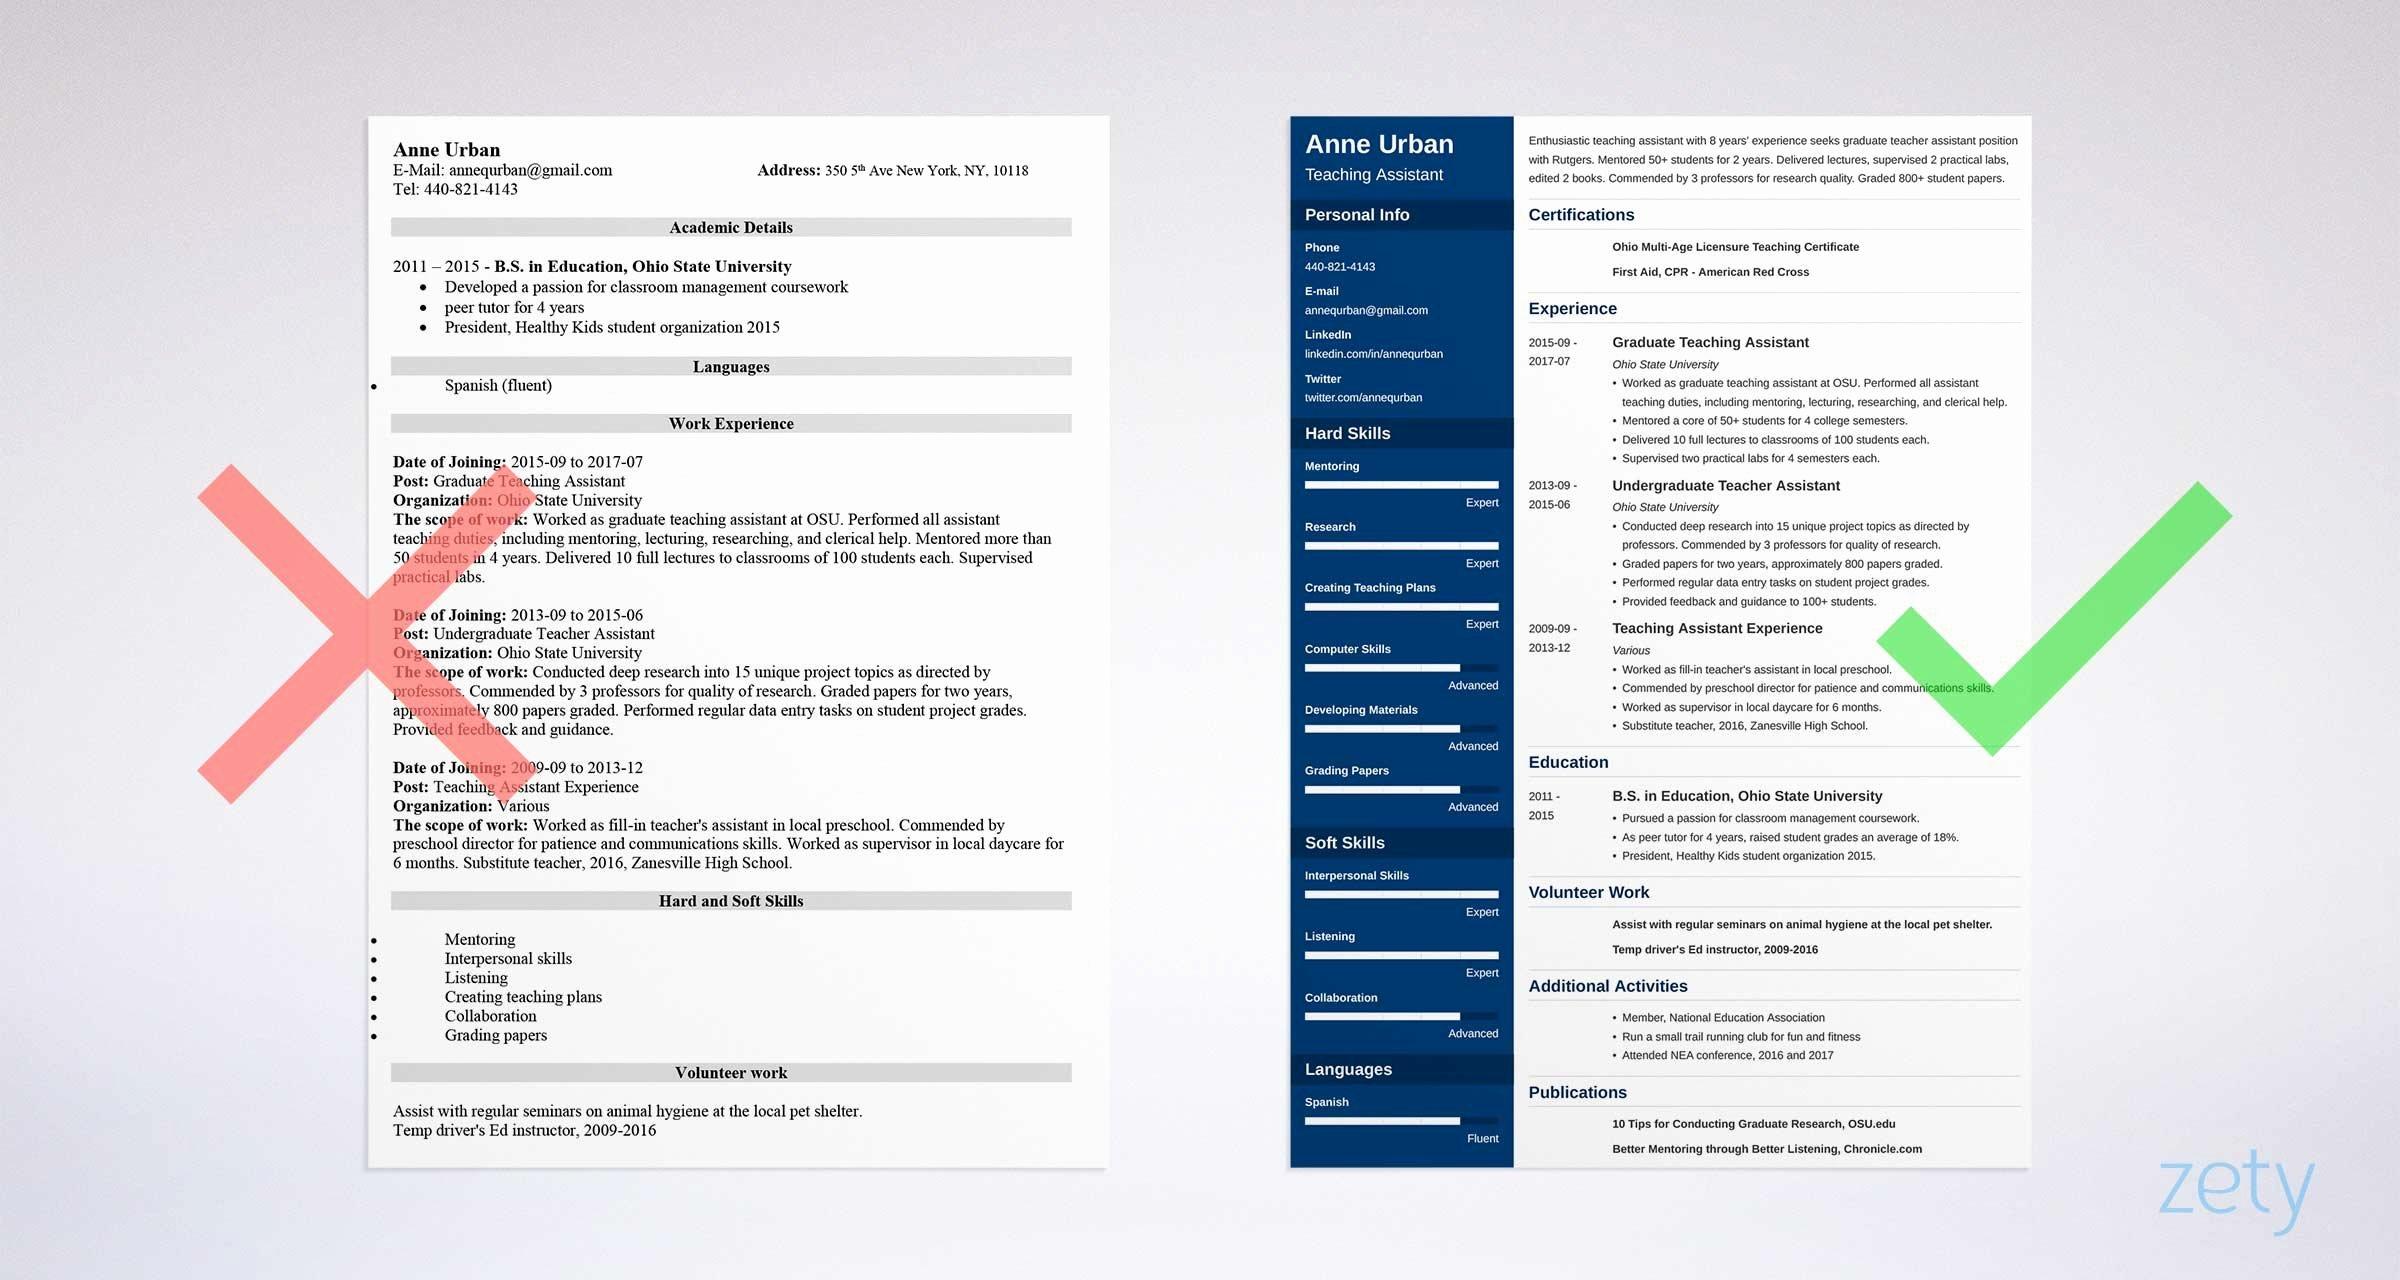 Teaching assistant Sample Resume Luxury Teaching assistant Resume Sample & Writing Guide [20